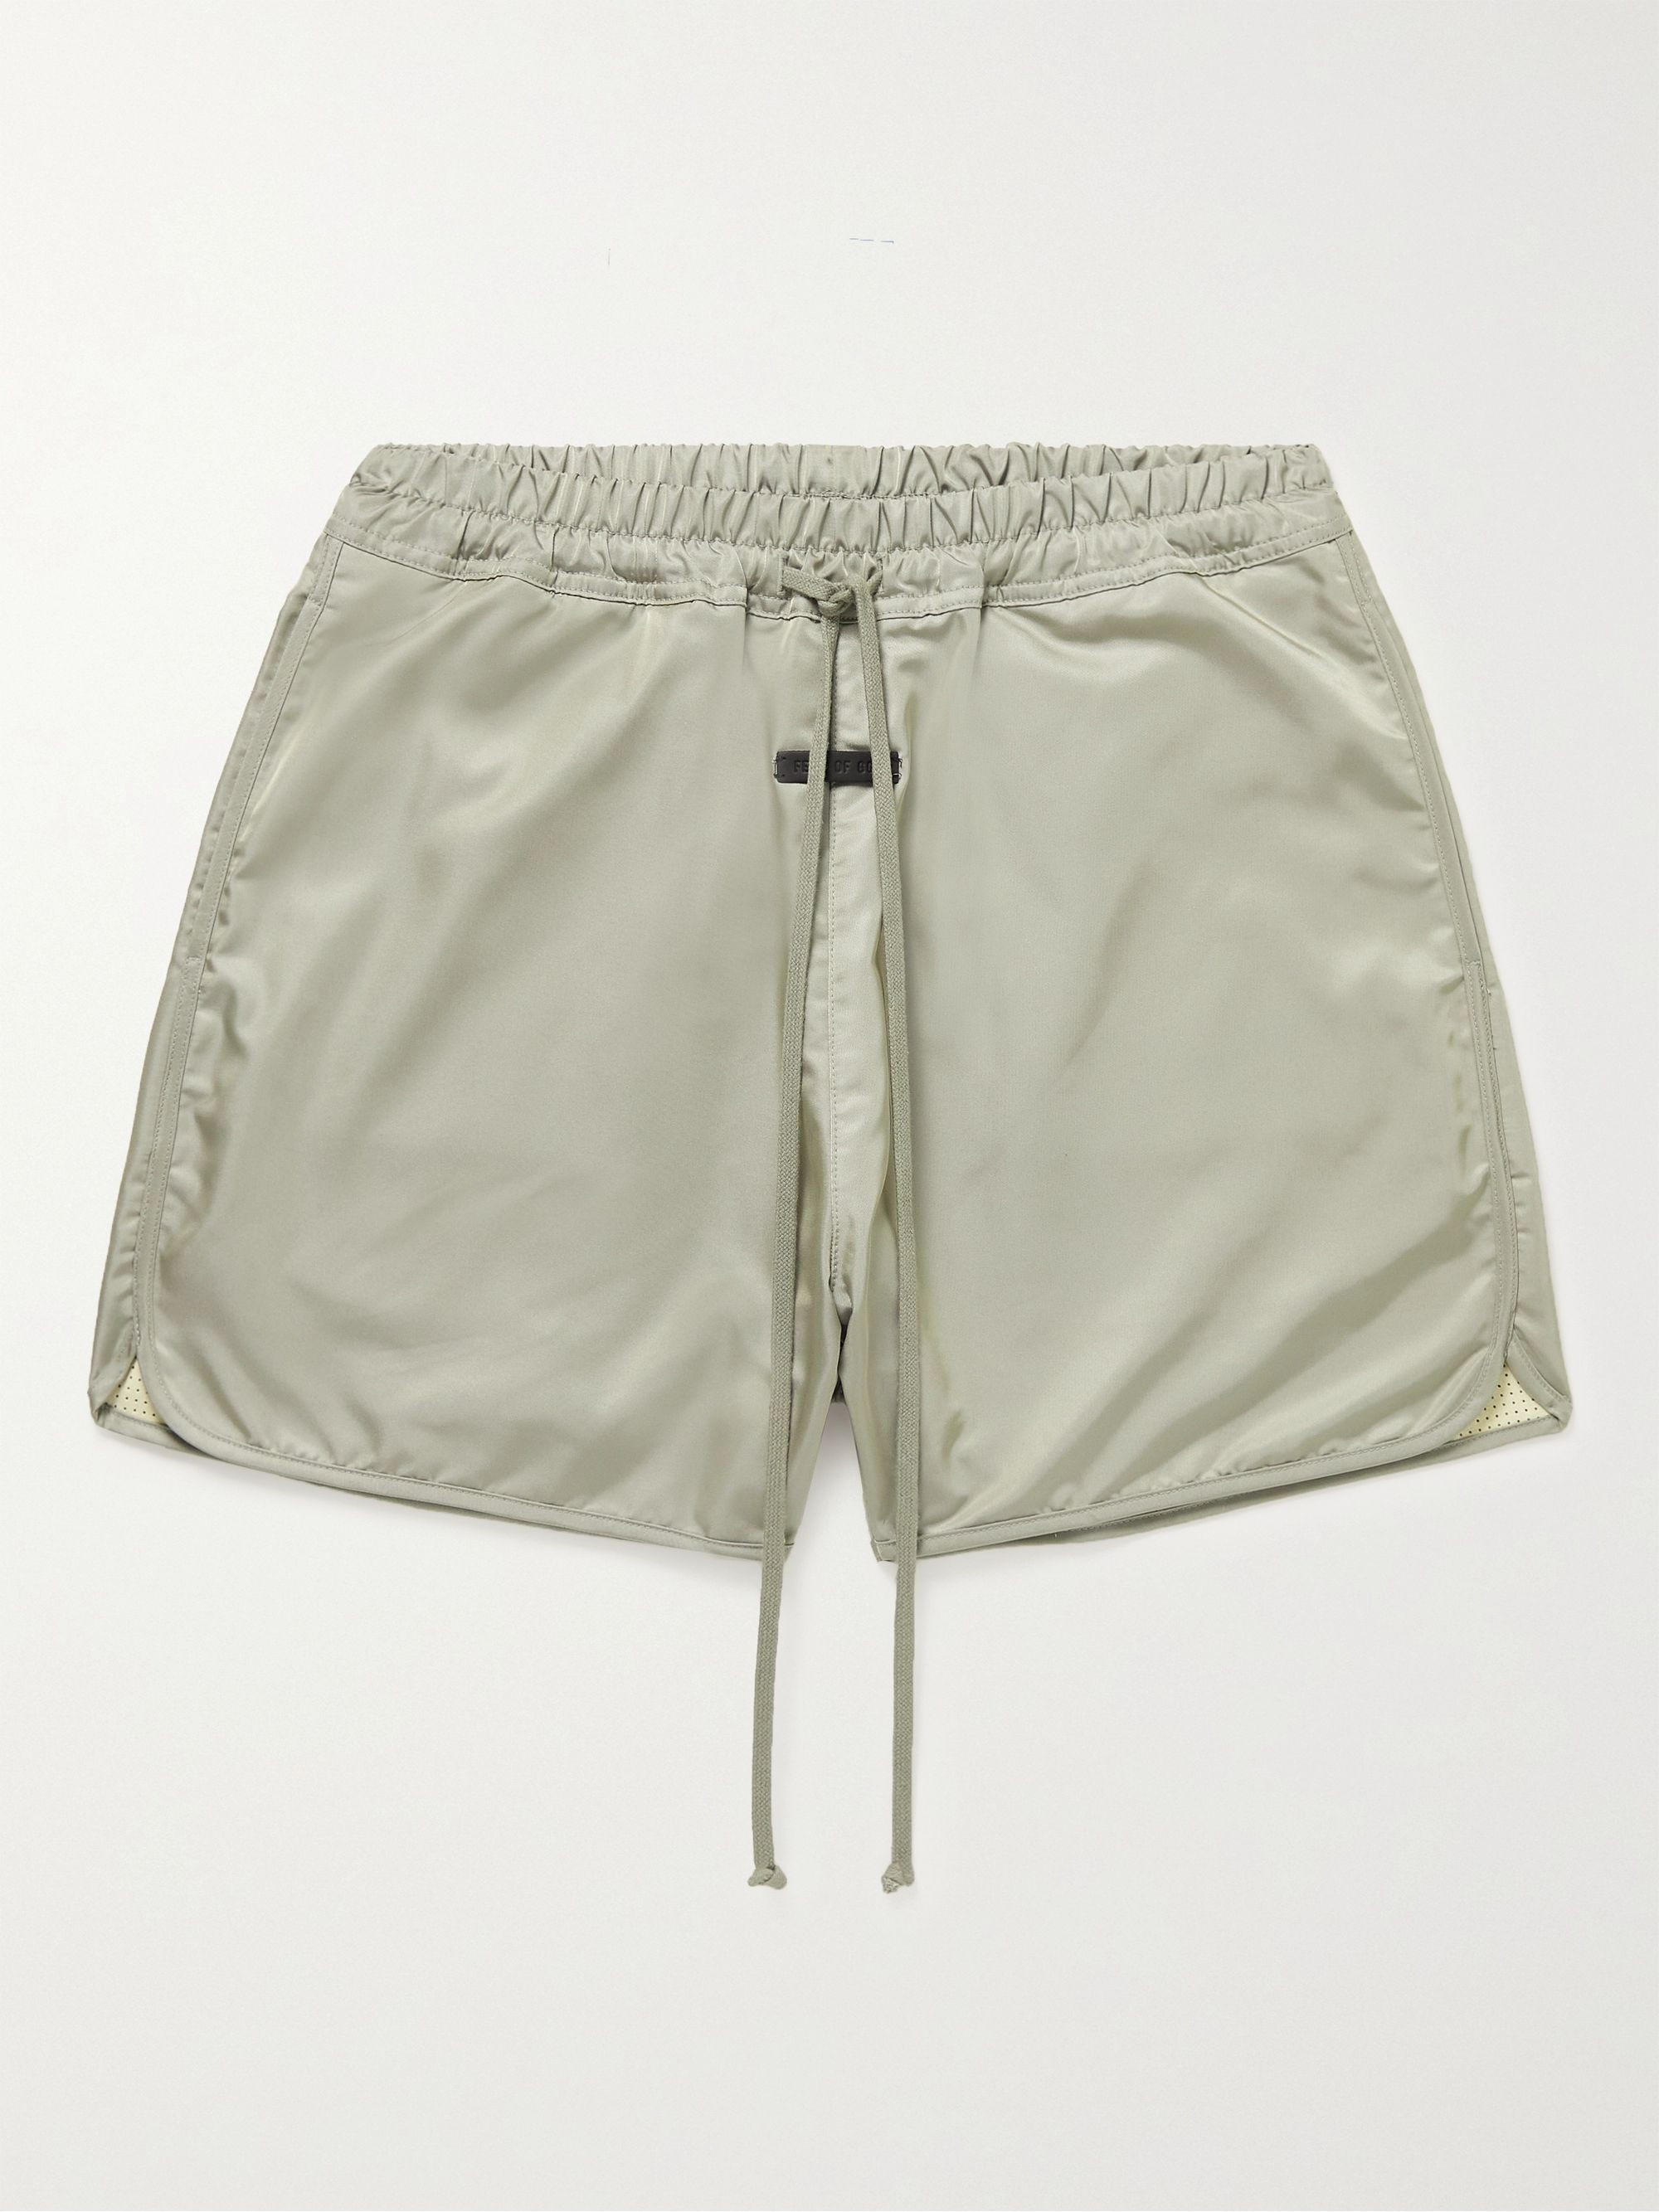 Fear of God Wide-Leg Logo-Appliqued Iridescent Nylon Drawstring Shorts,Gray